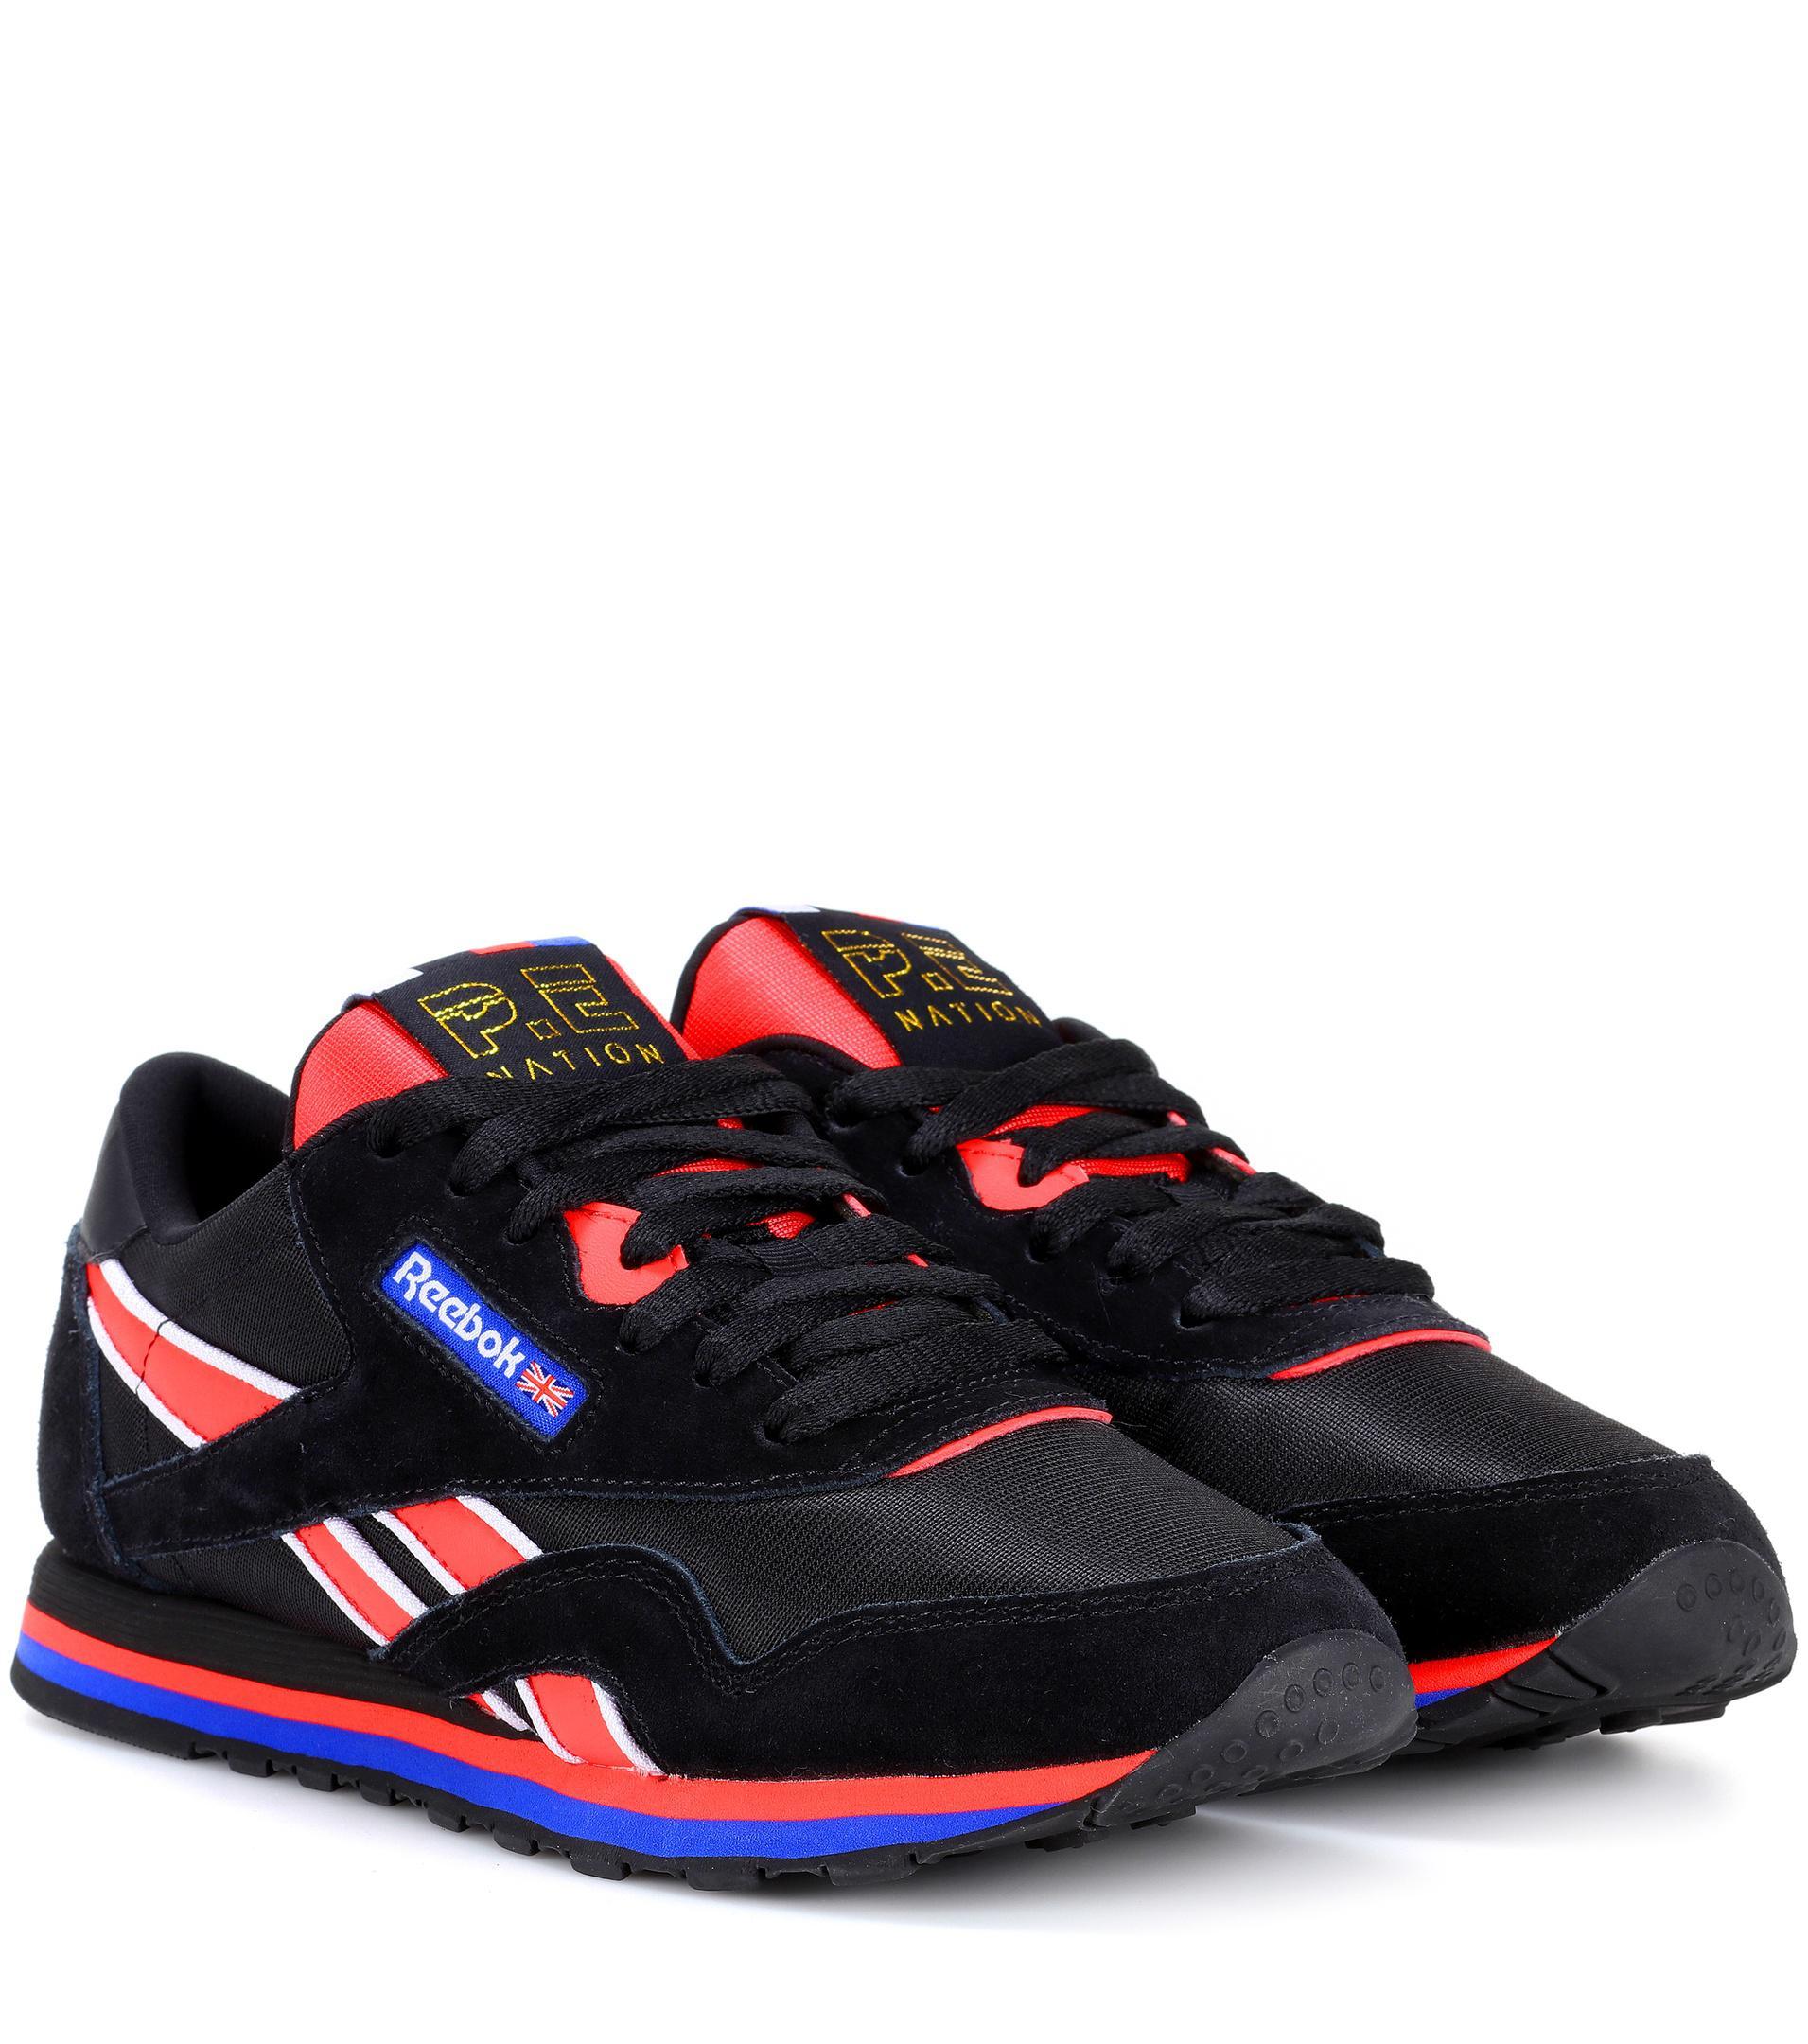 d7bb4de3b42110 Reebok X P.e Nation Classic Nylon Sneakers in Black - Lyst